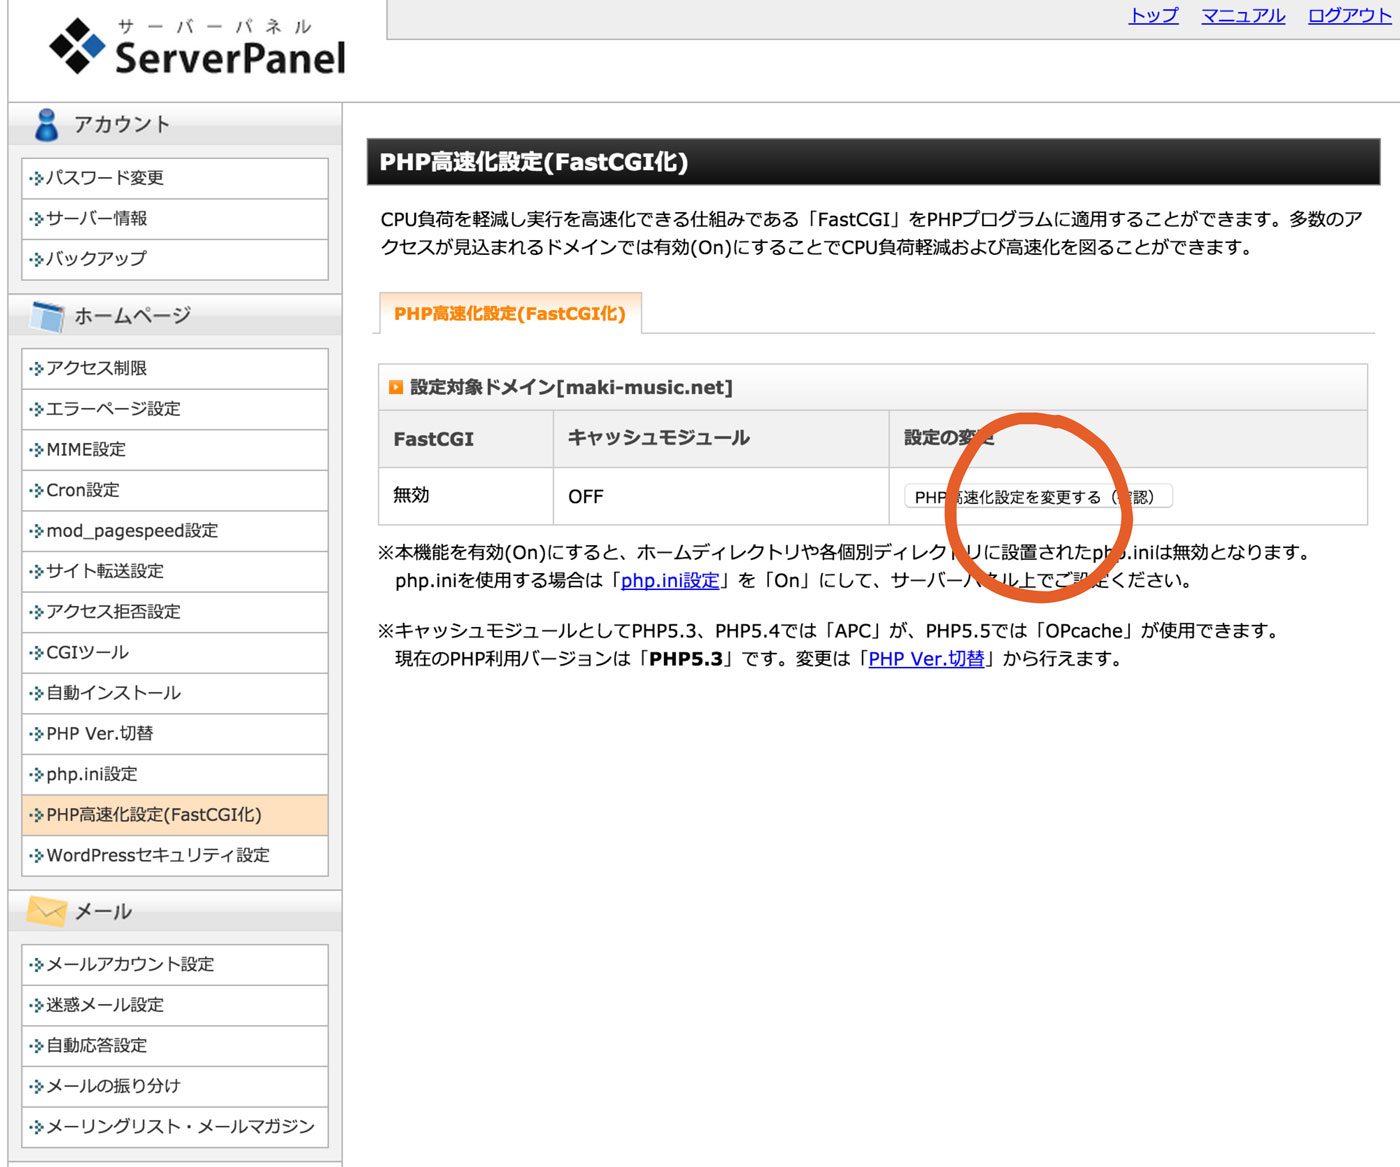 Xserverのサーバーパネル、「PHP高速化設定を変更する」をクリック